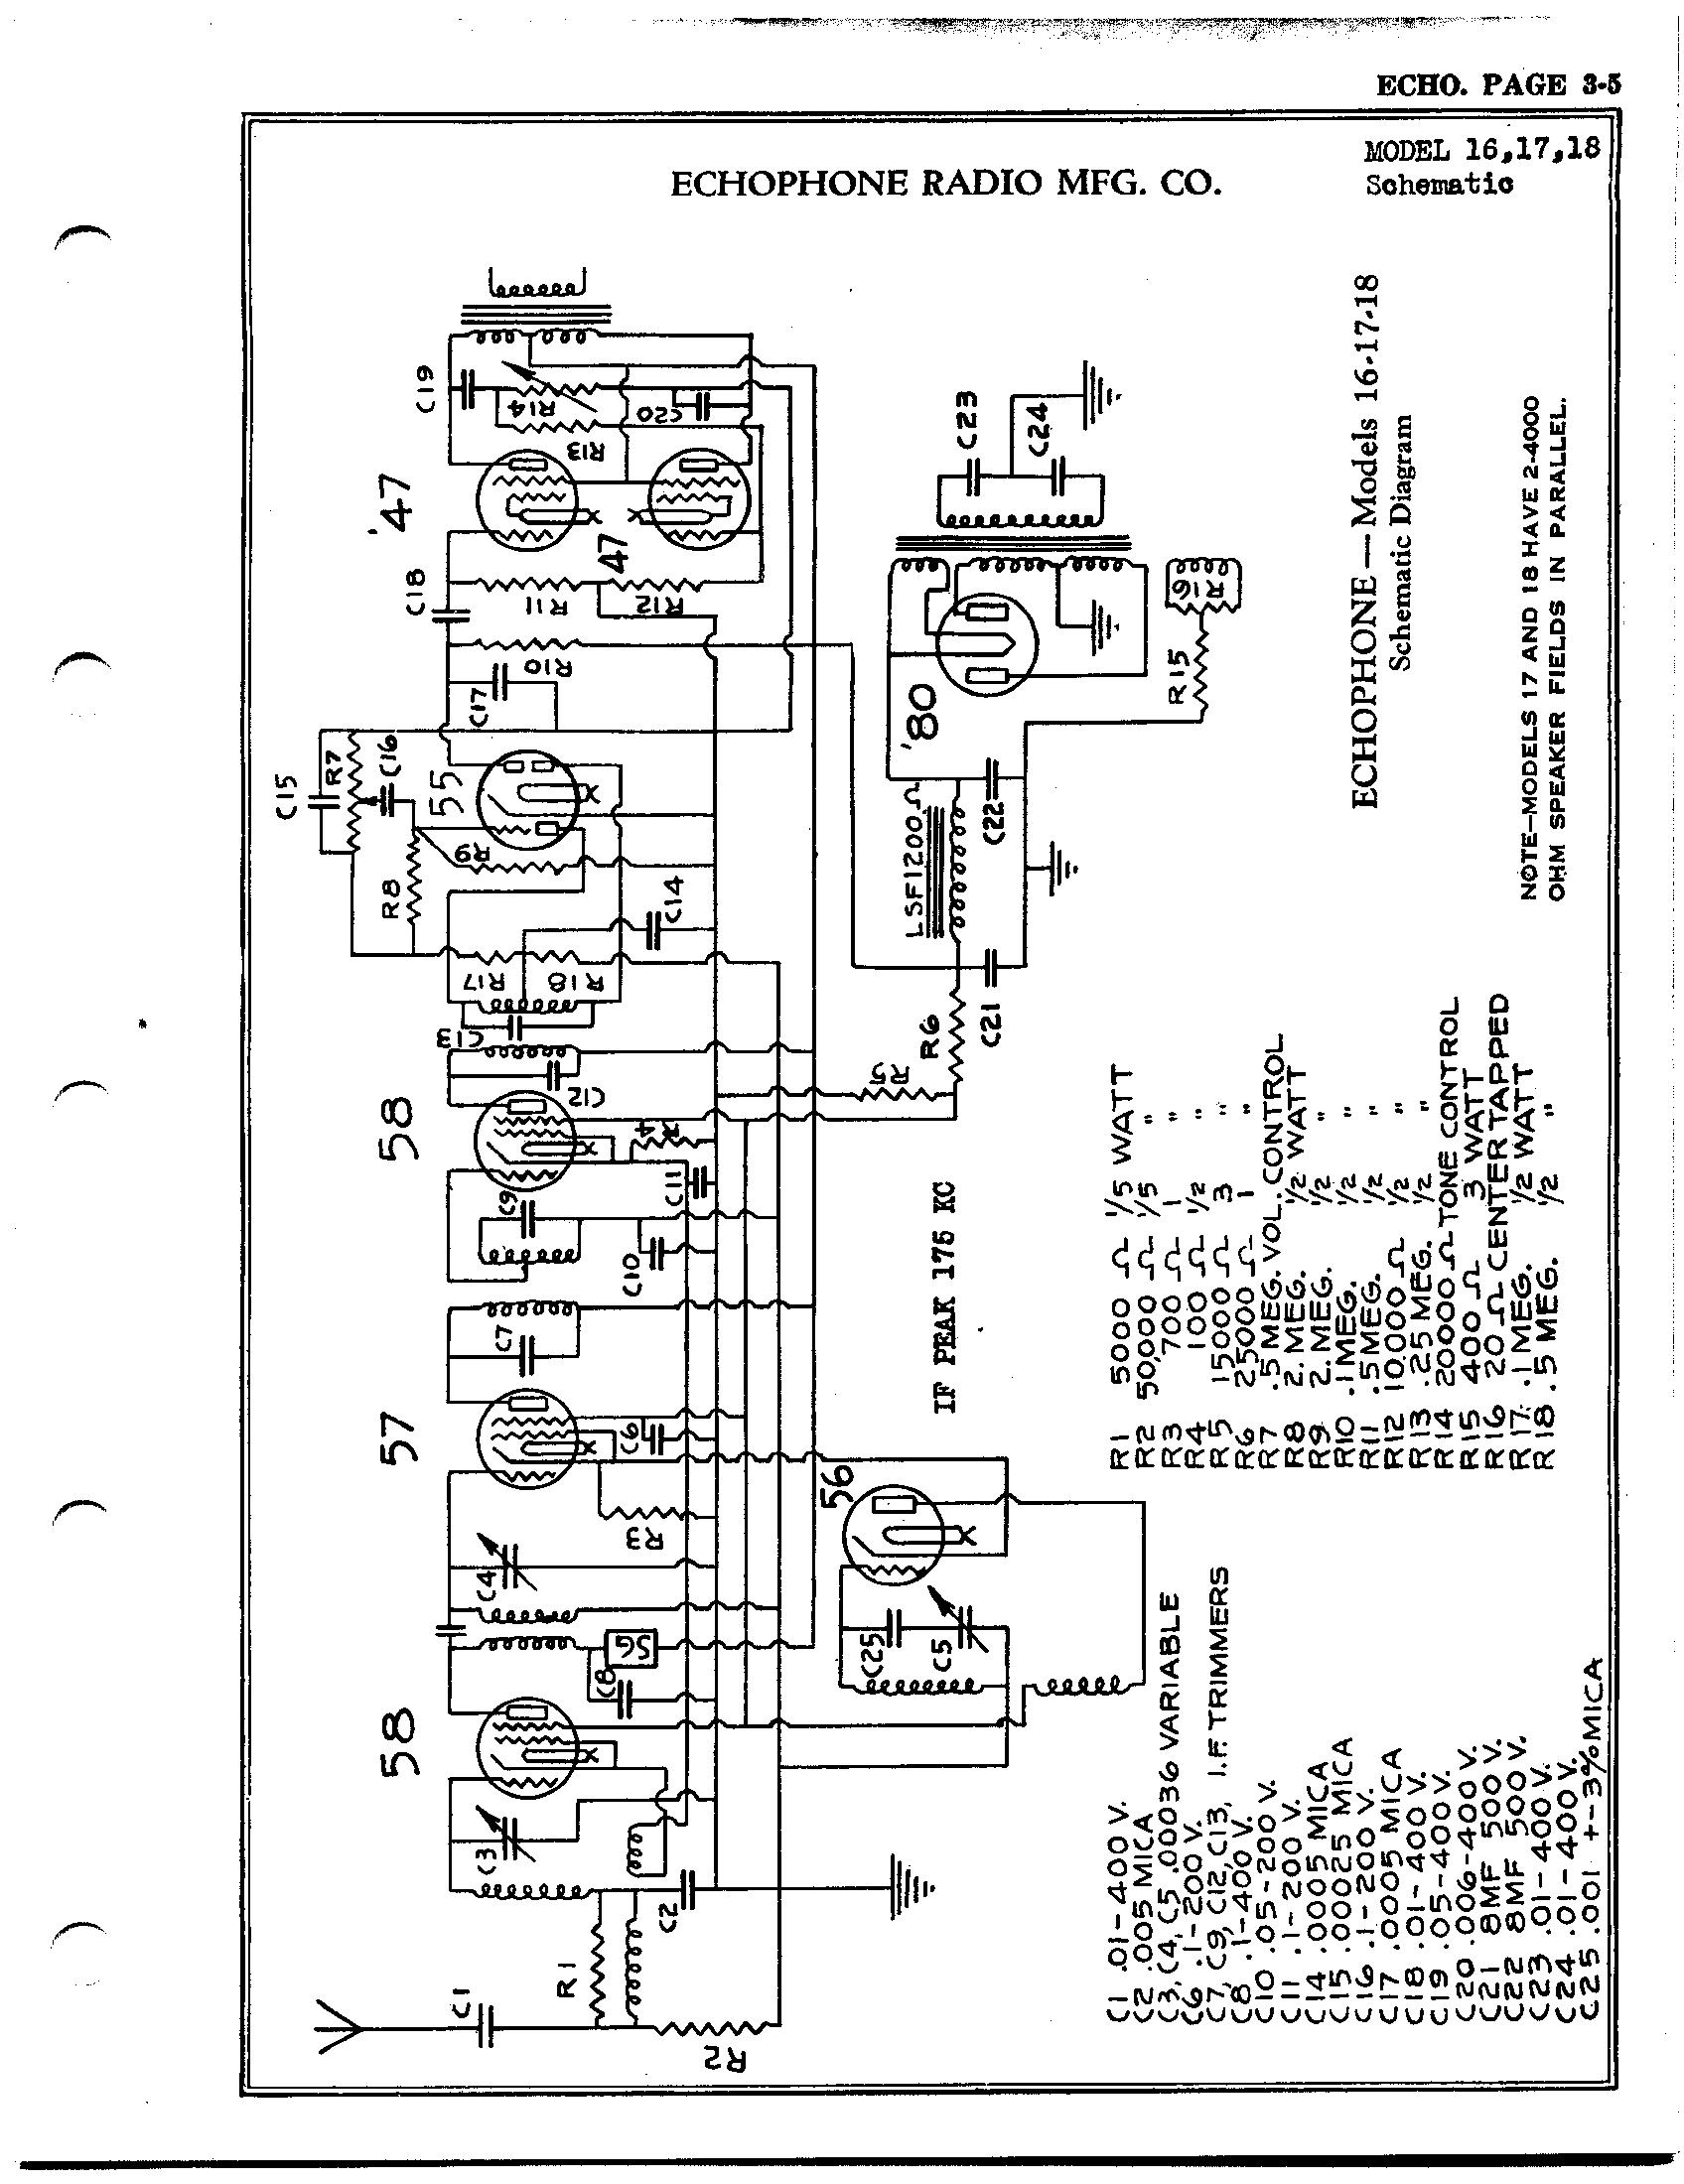 Echophone Radio Corp 17